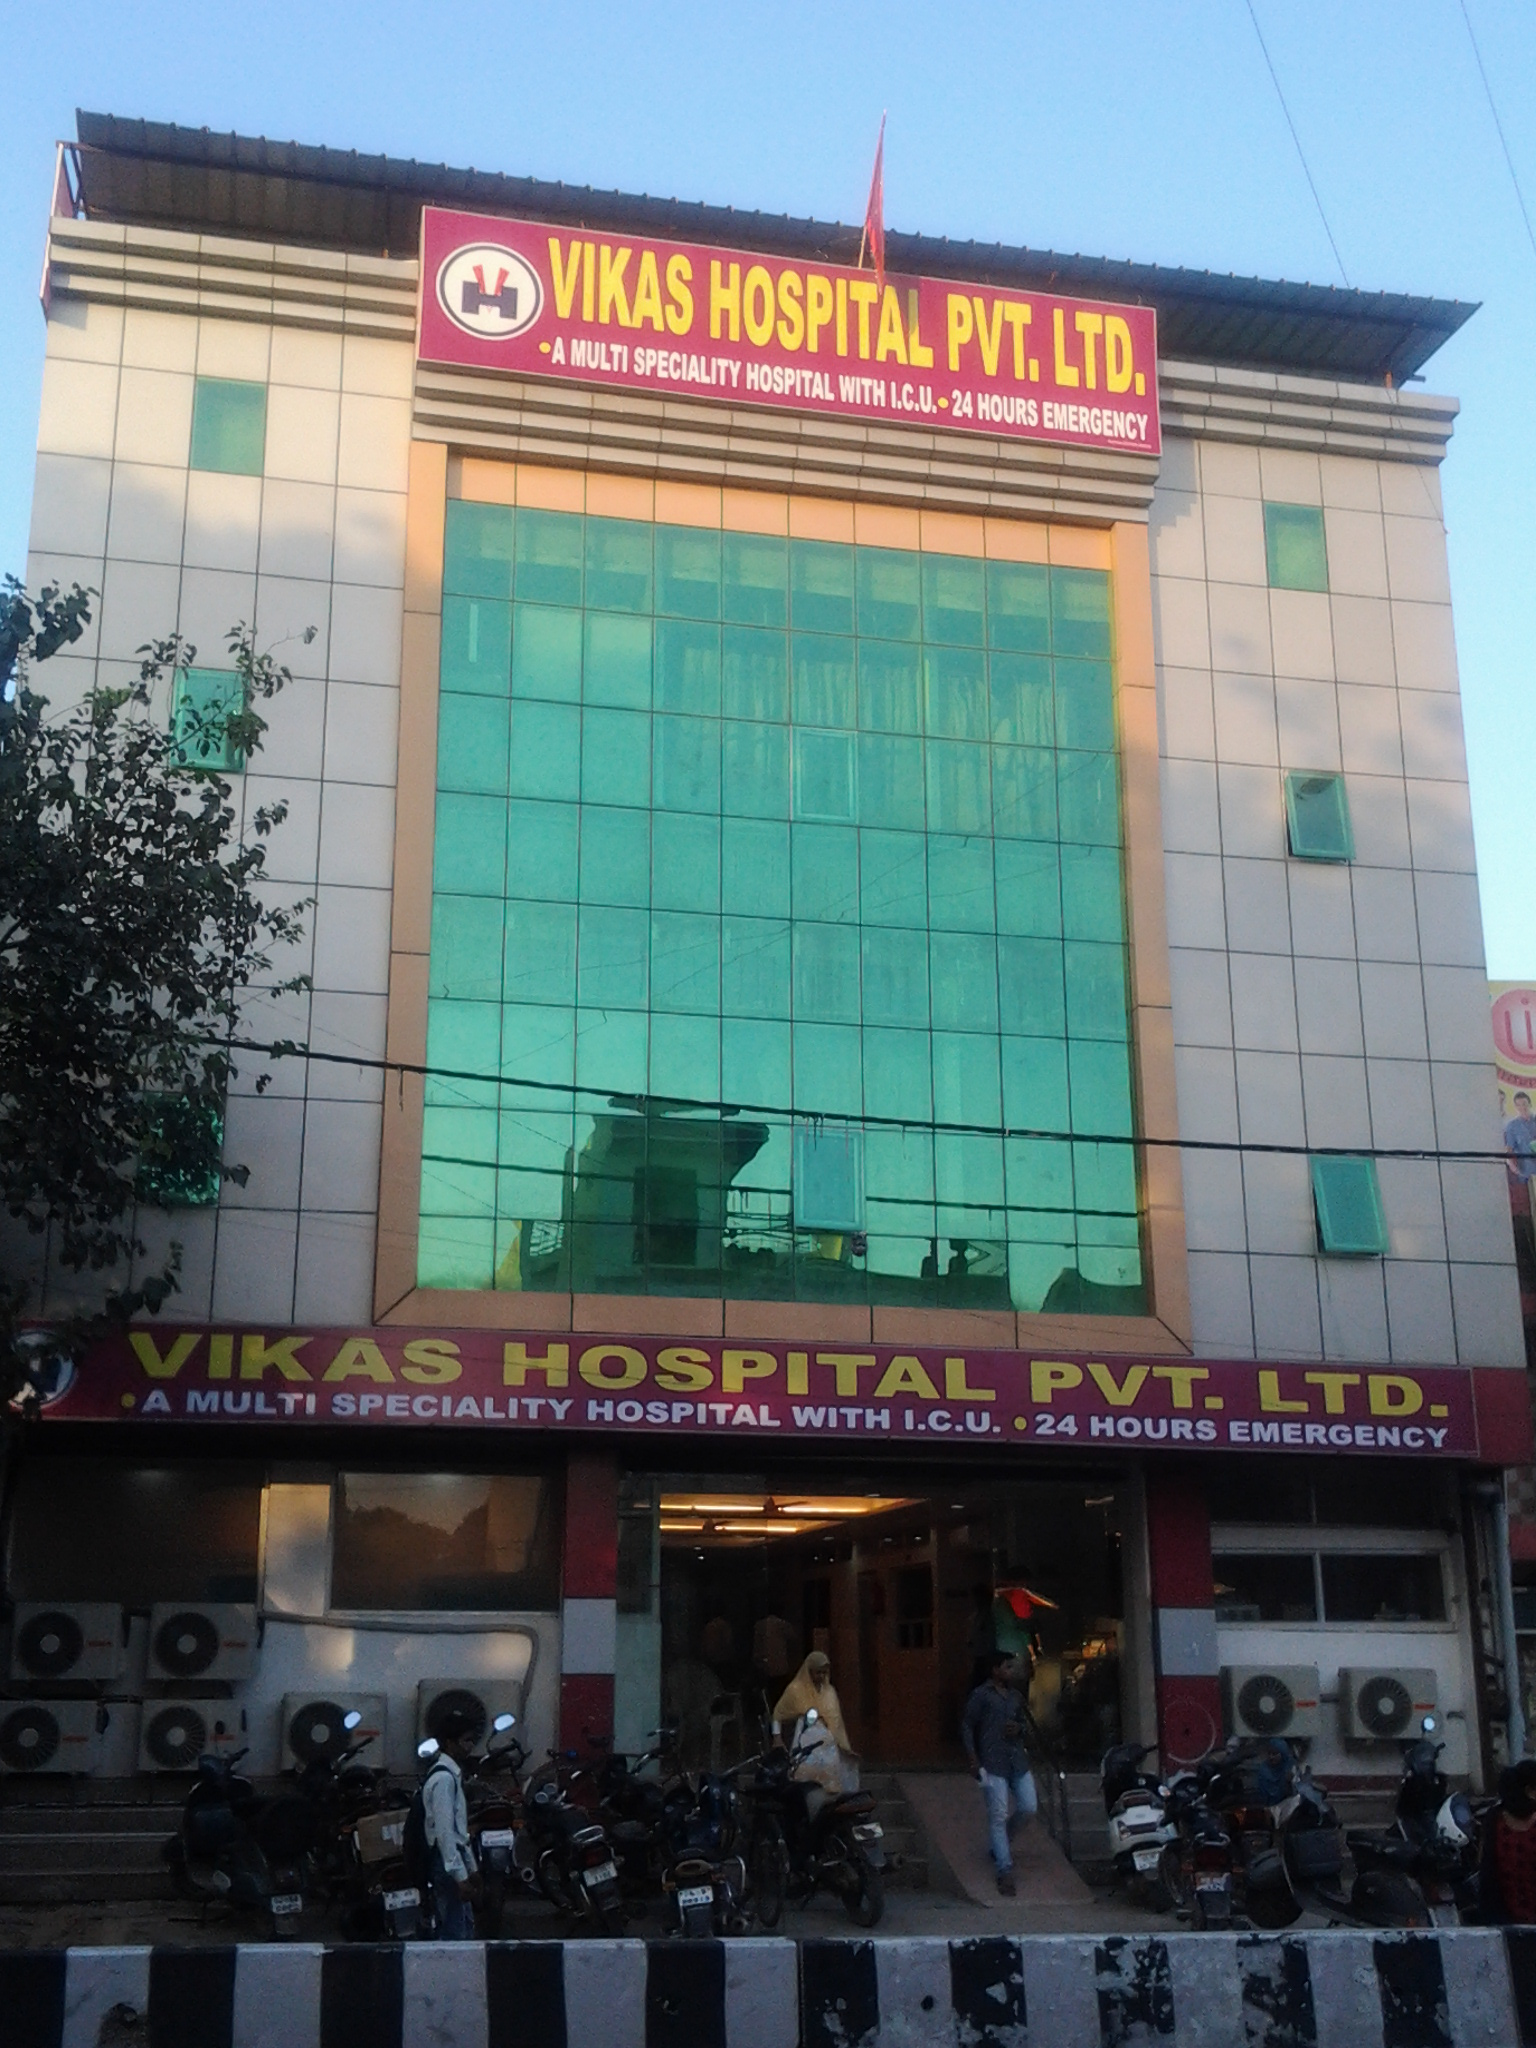 Vikas Hospital Pvt Ltd